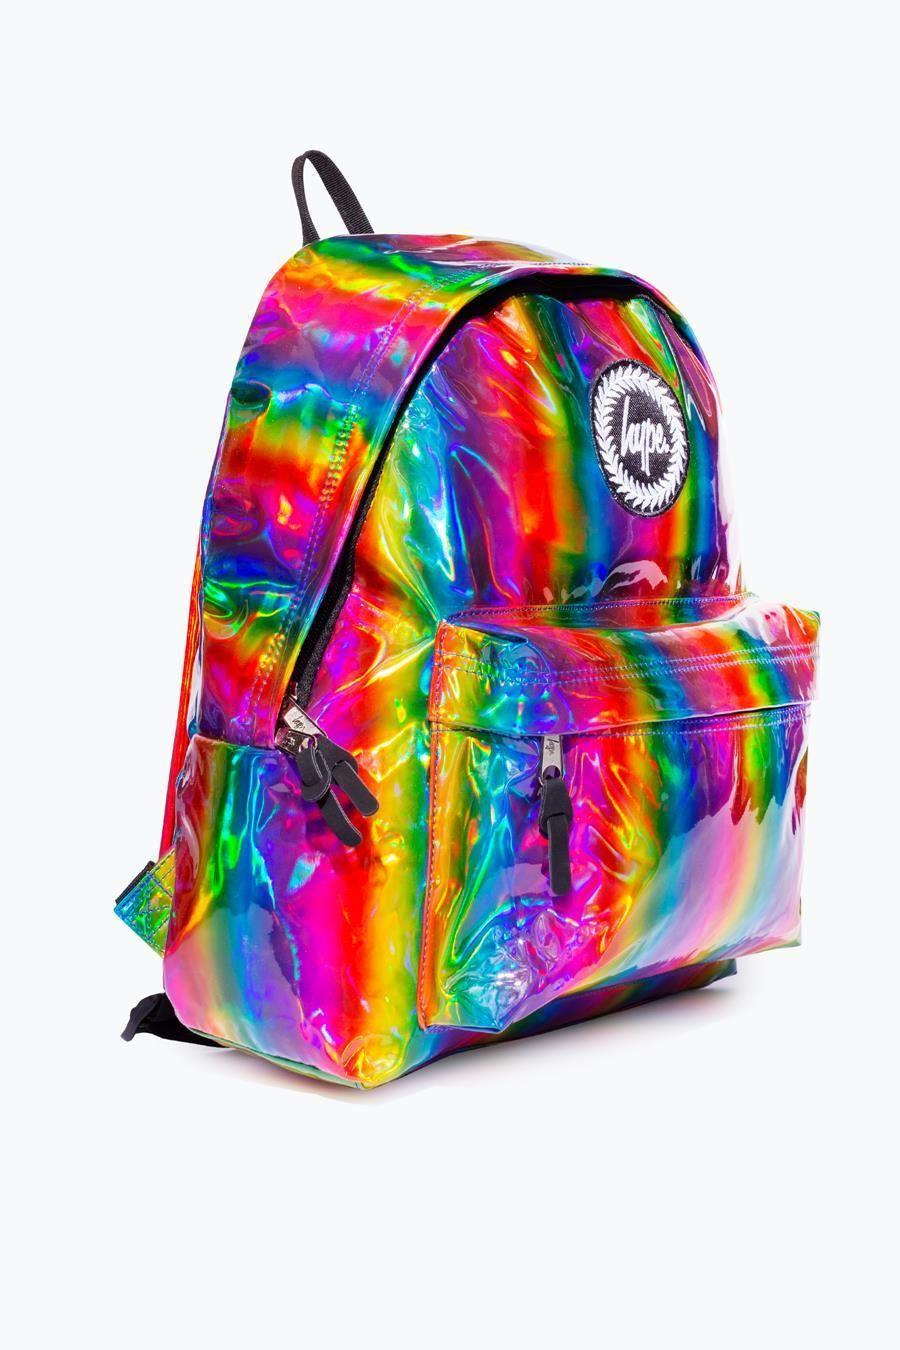 Rainbow Holo Backpack